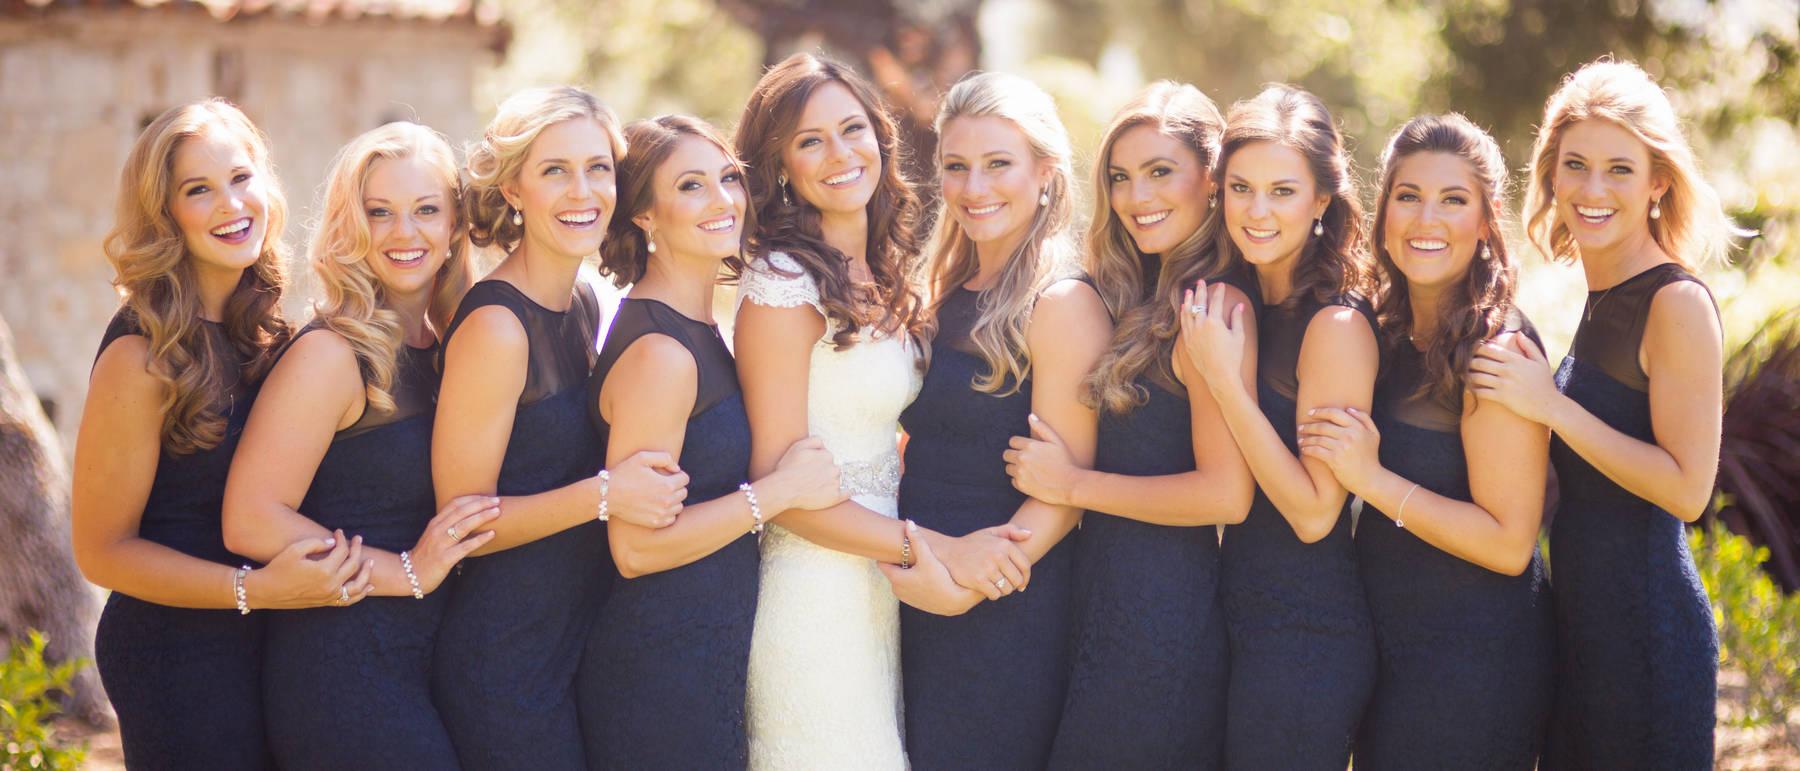 johnandjoseph-wedding-photographer-hz-slider-224